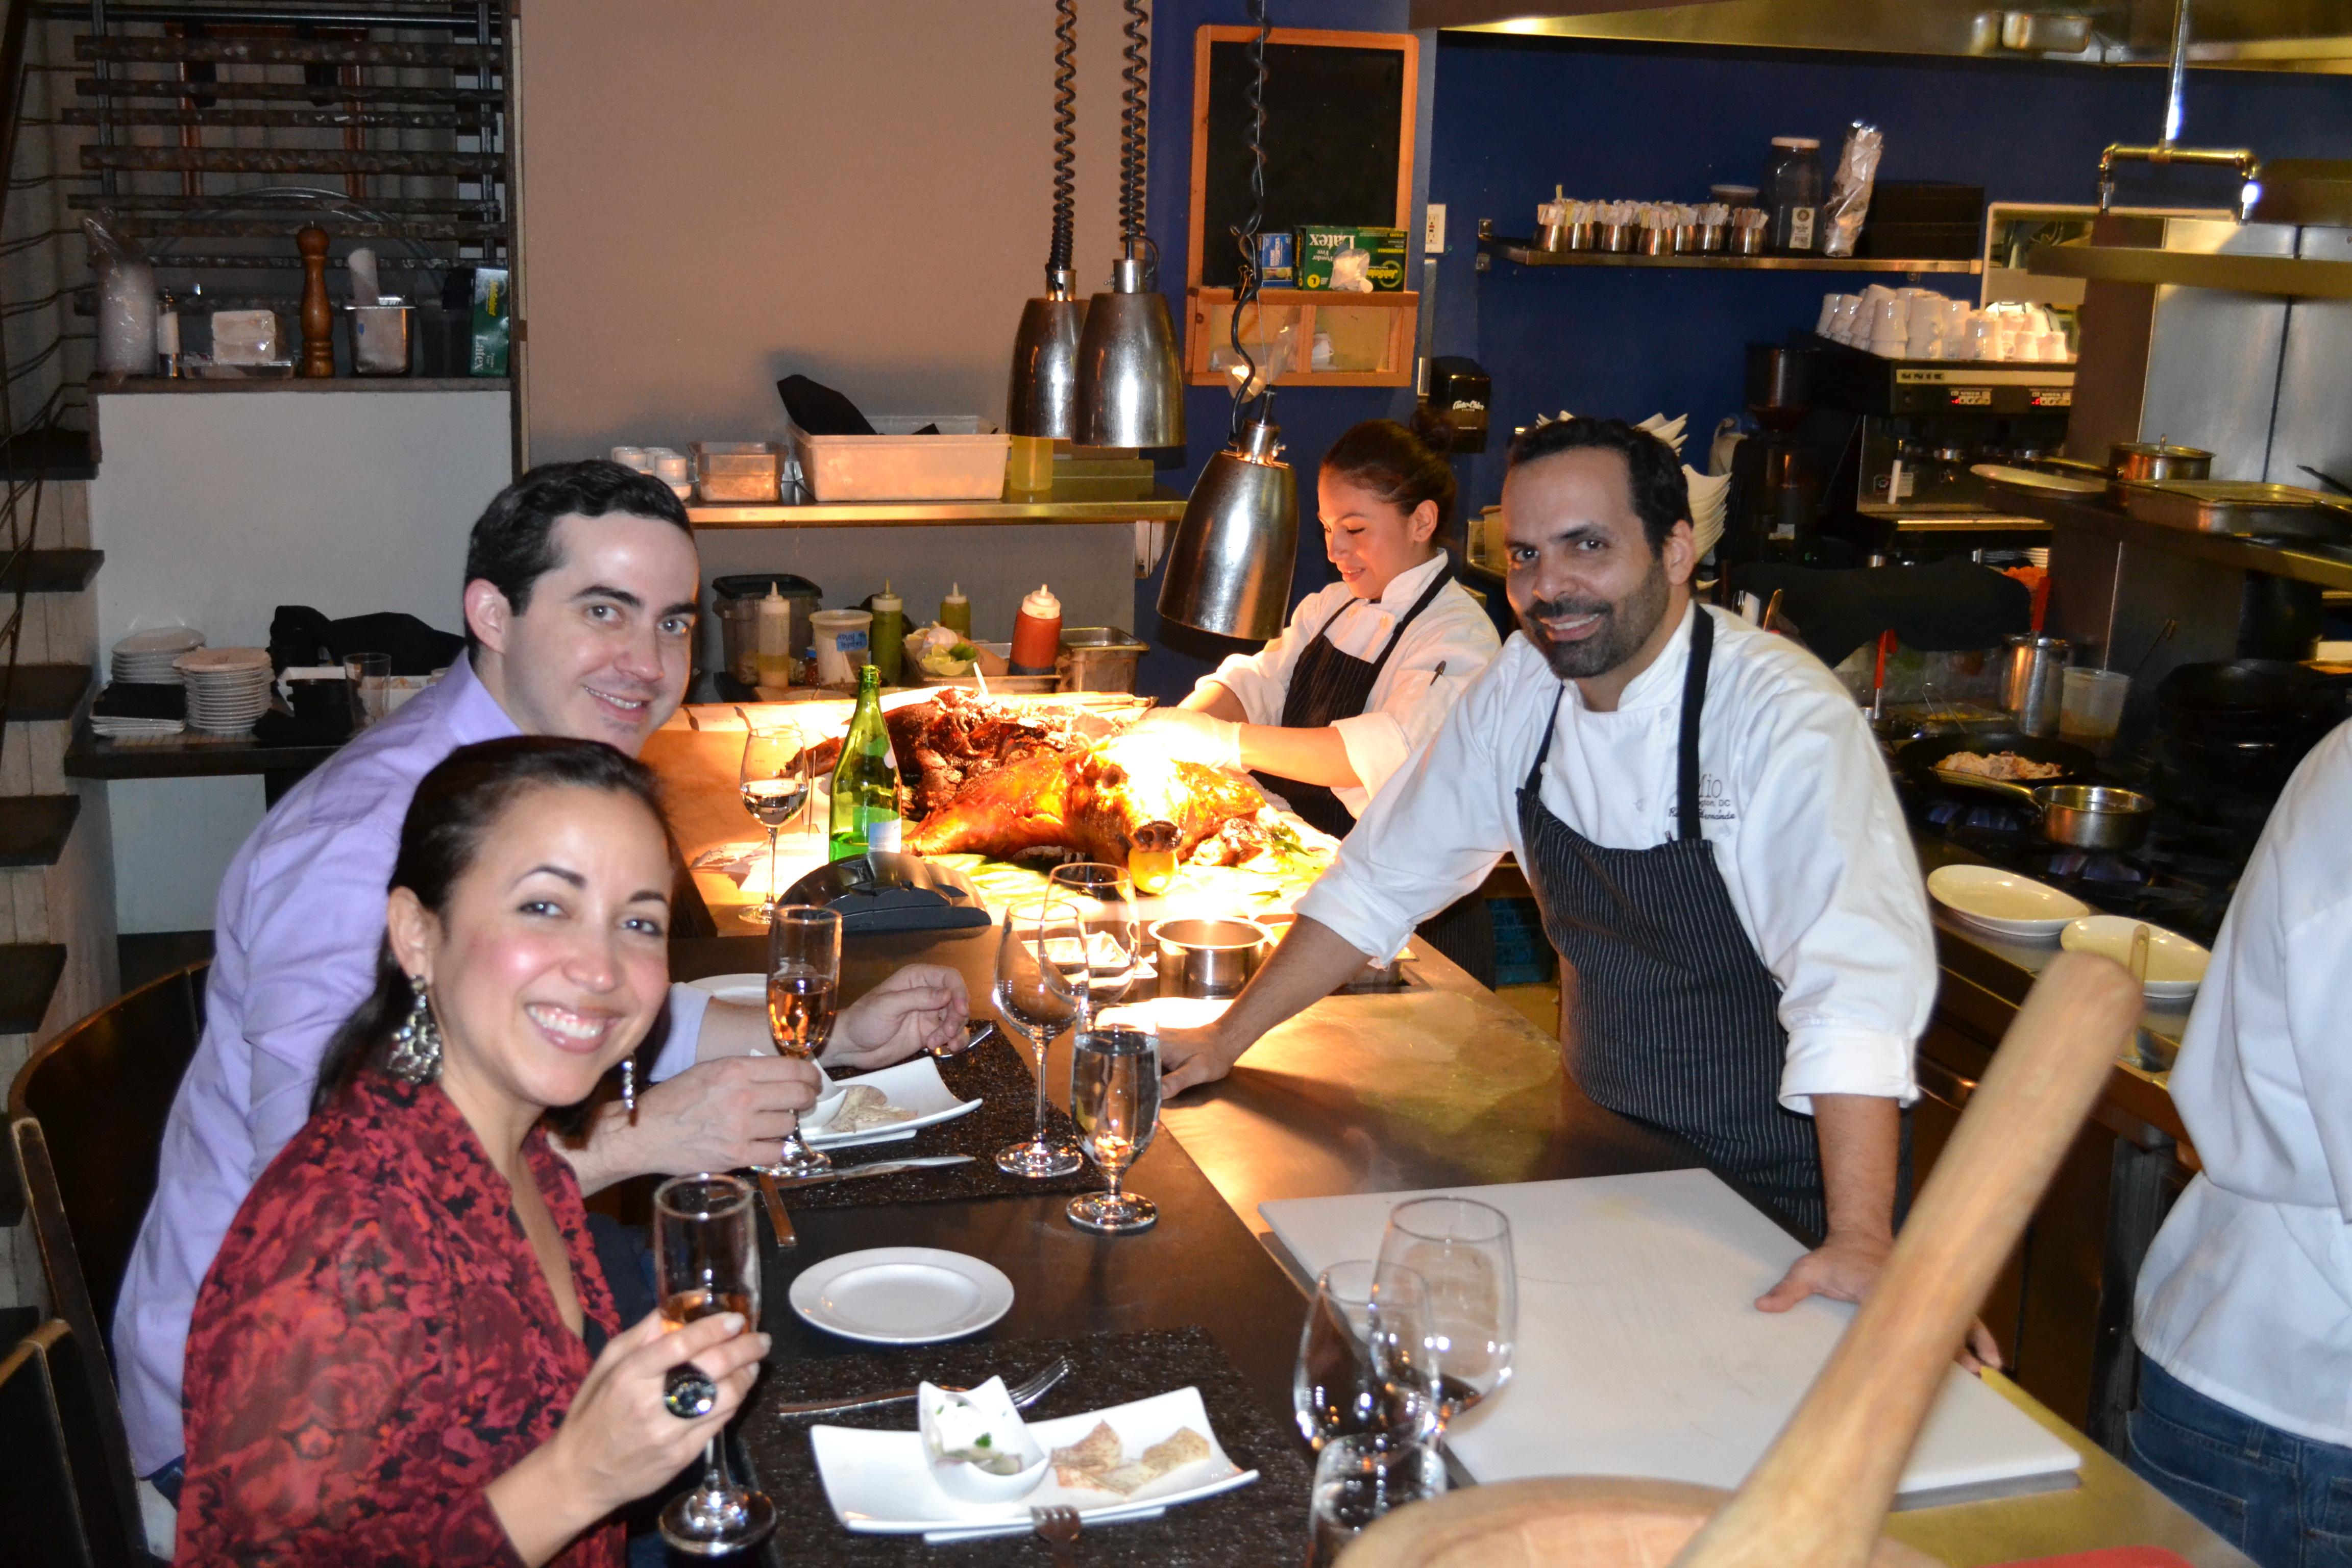 chef Roberto Hernandez prepares a nine-course tasting menu at the new chef's counter. (Photo: Mio)